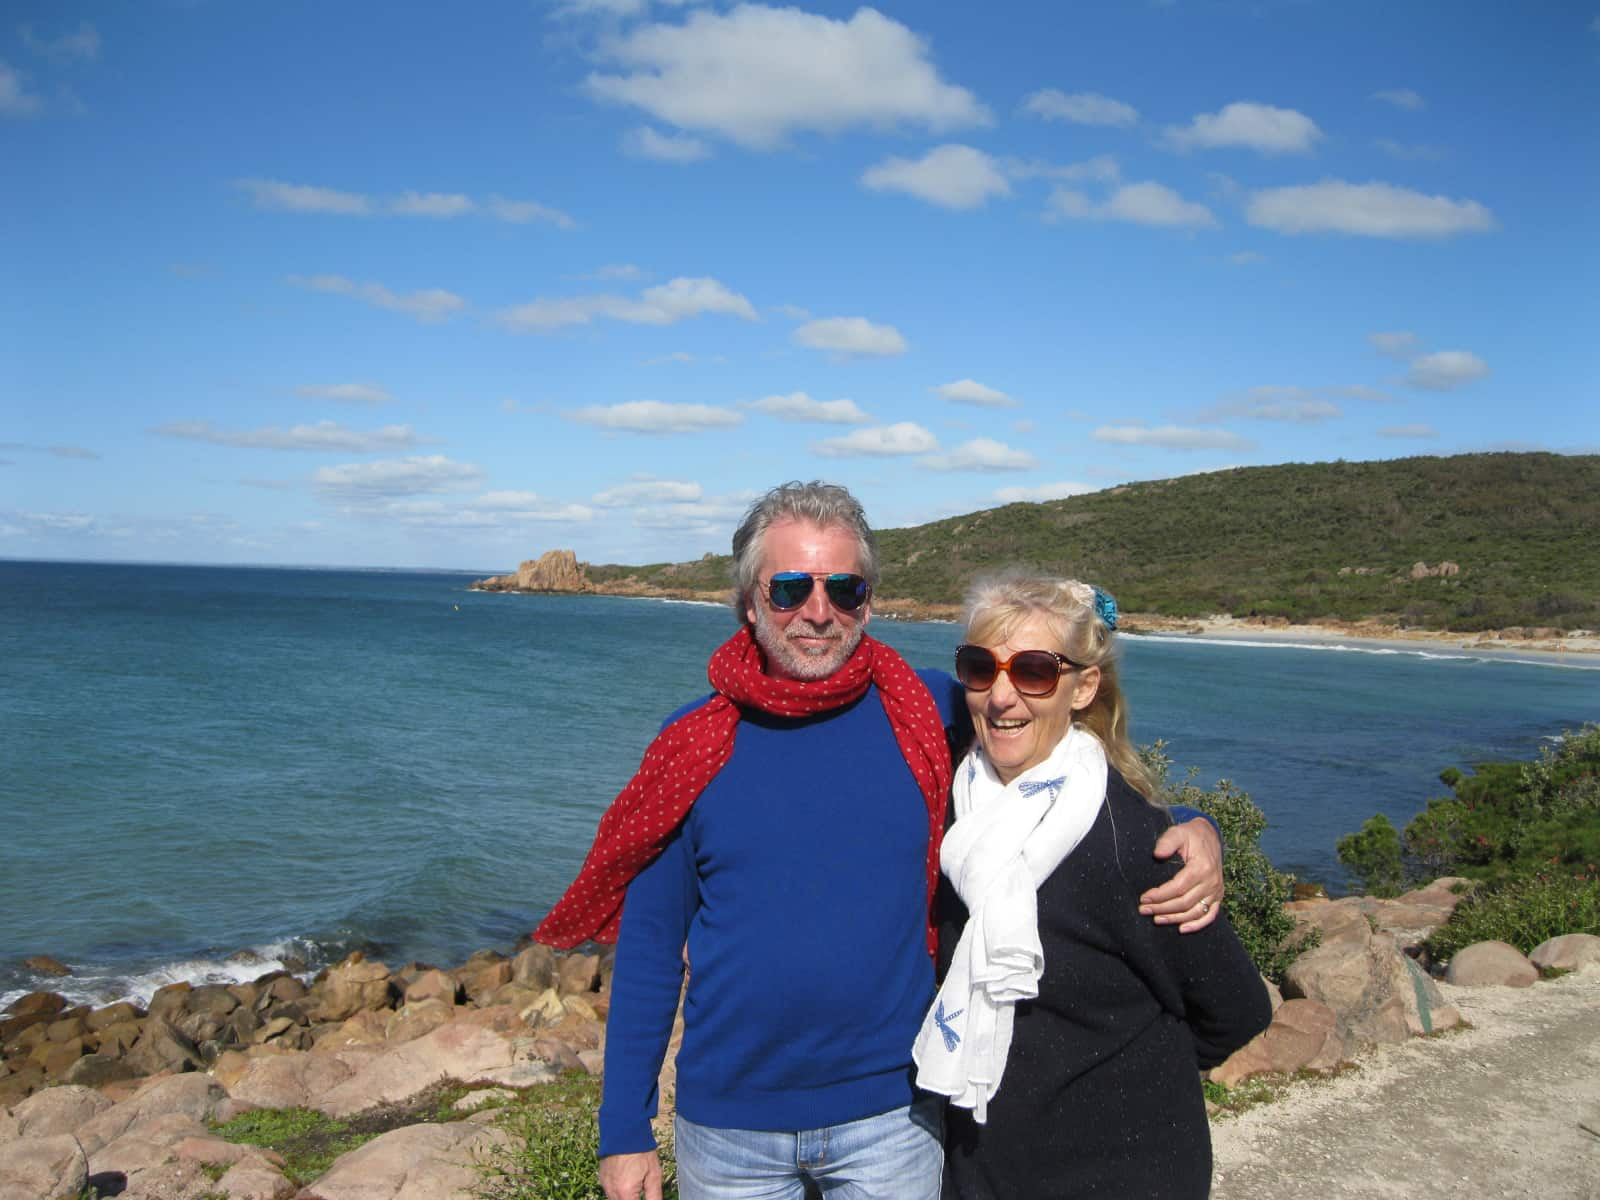 Tricia & John from Busselton, Western Australia, Australia